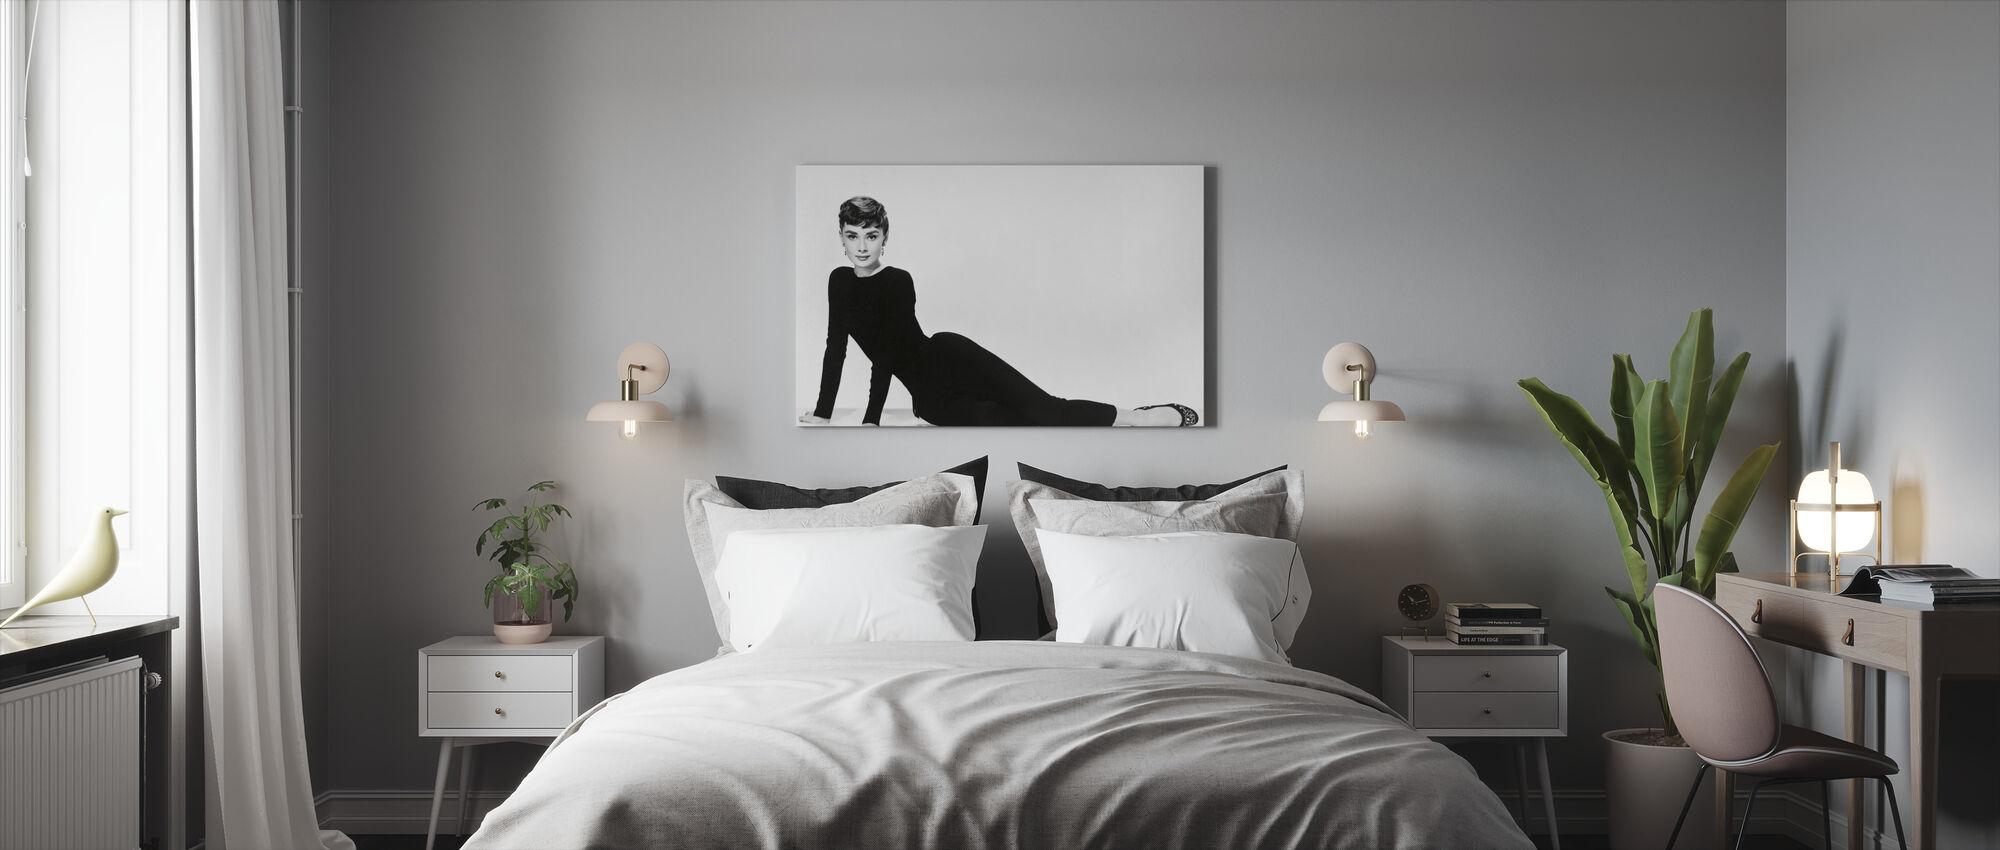 Audrey Hepburn i Sabrina - Canvastavla - Sovrum